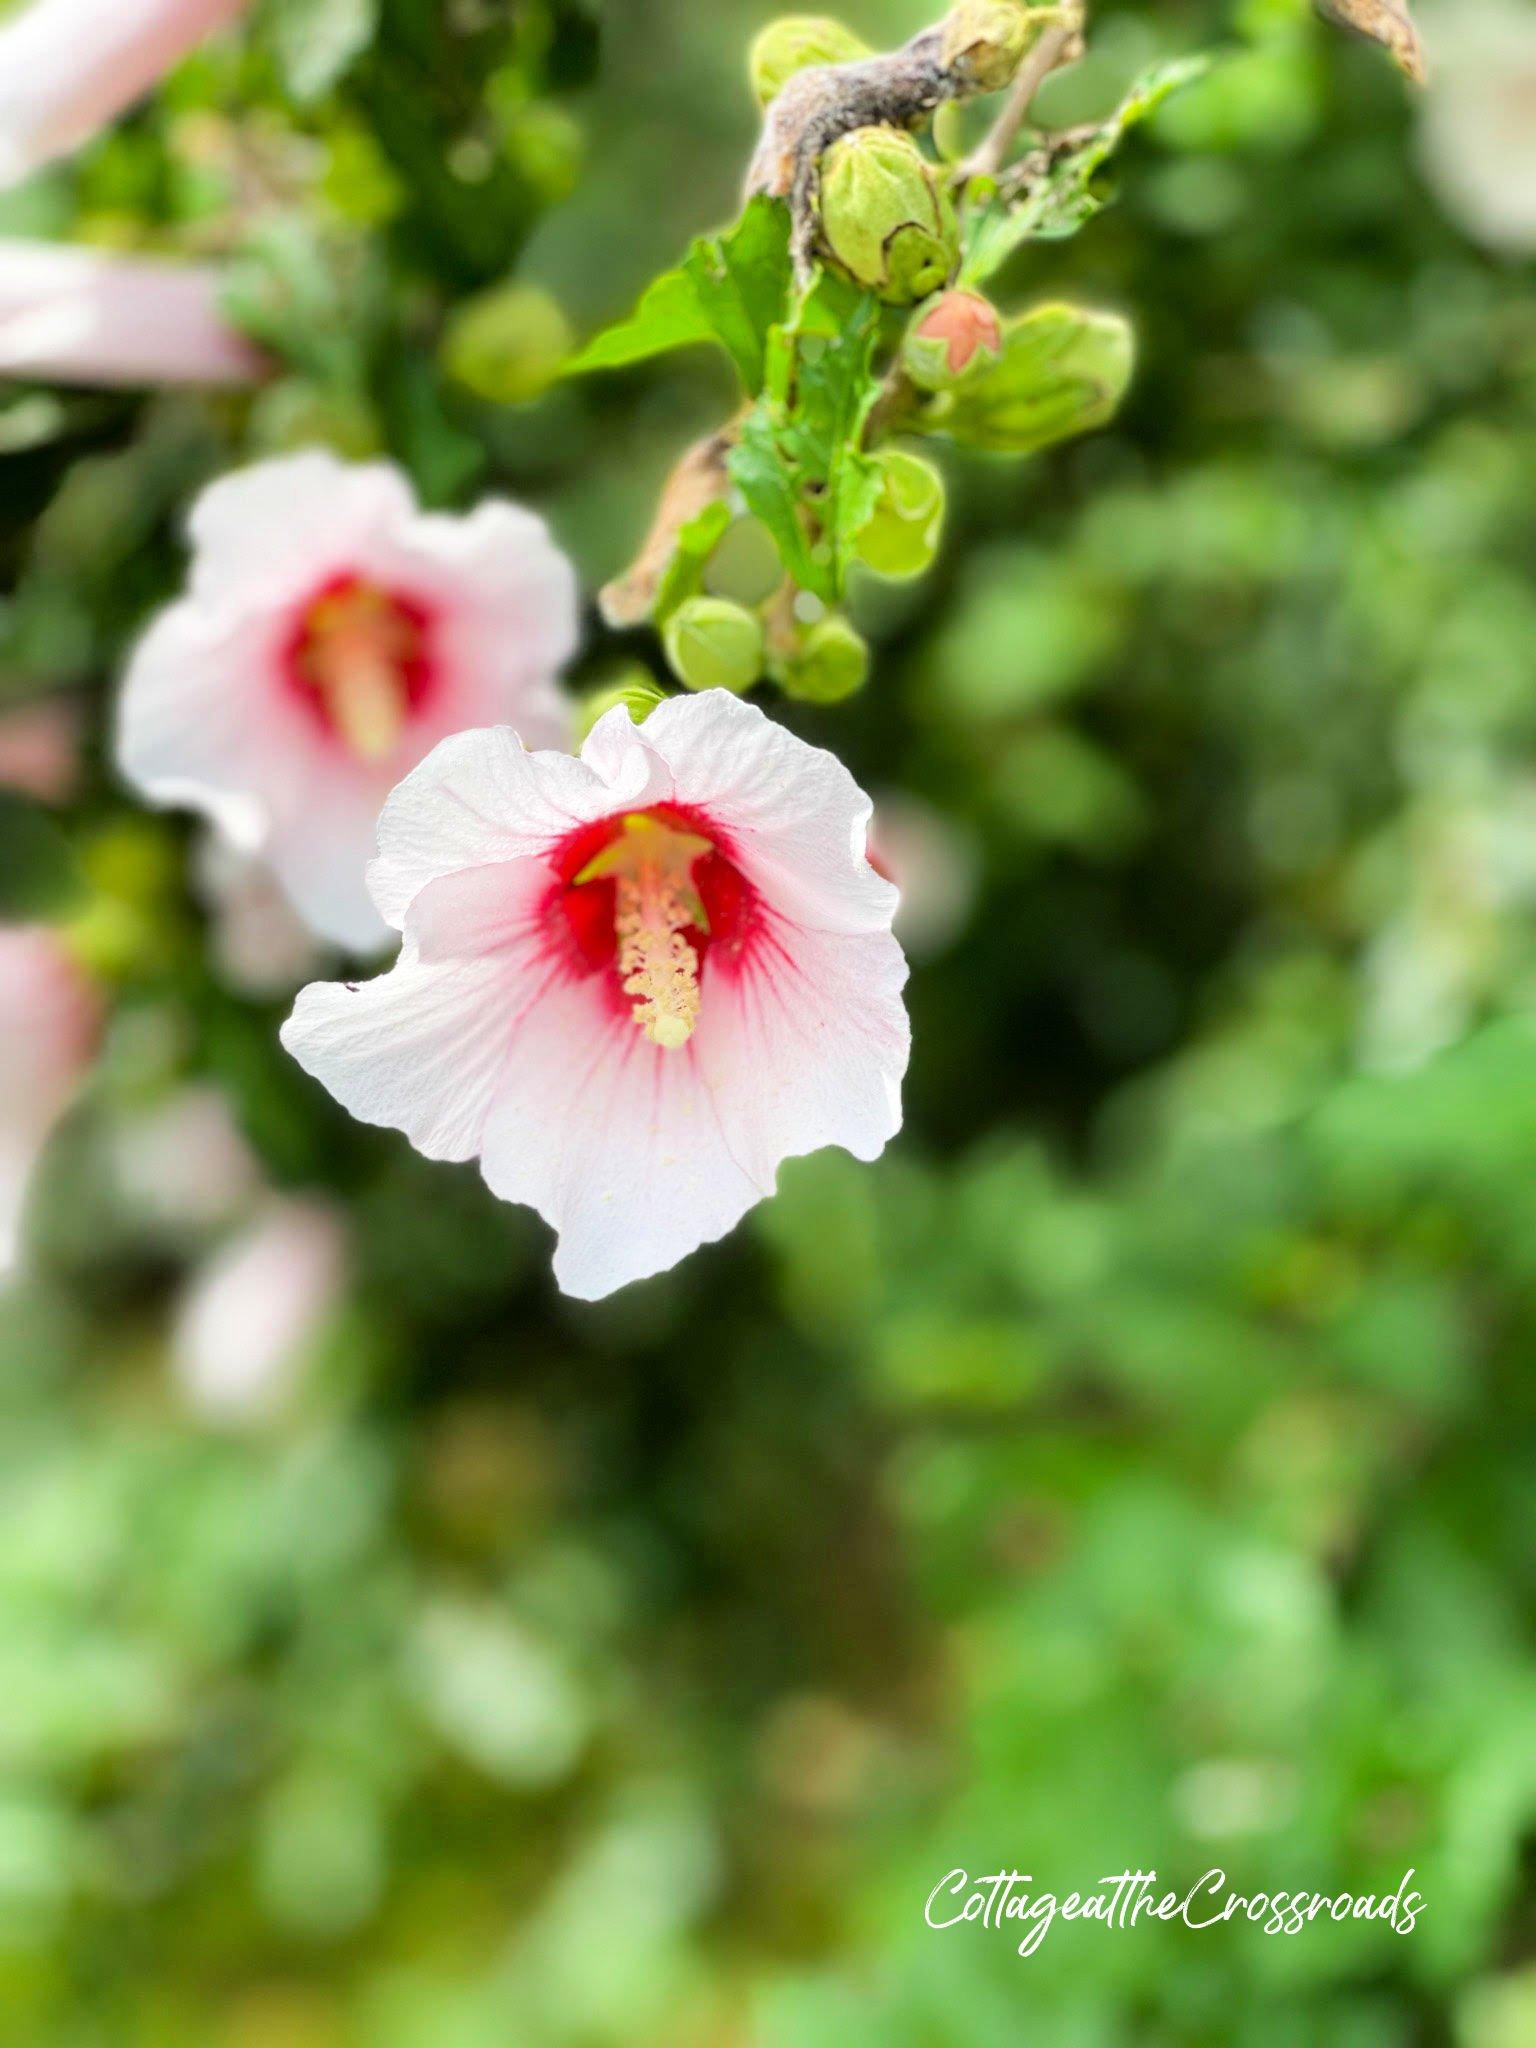 Rose of Sharon blossom